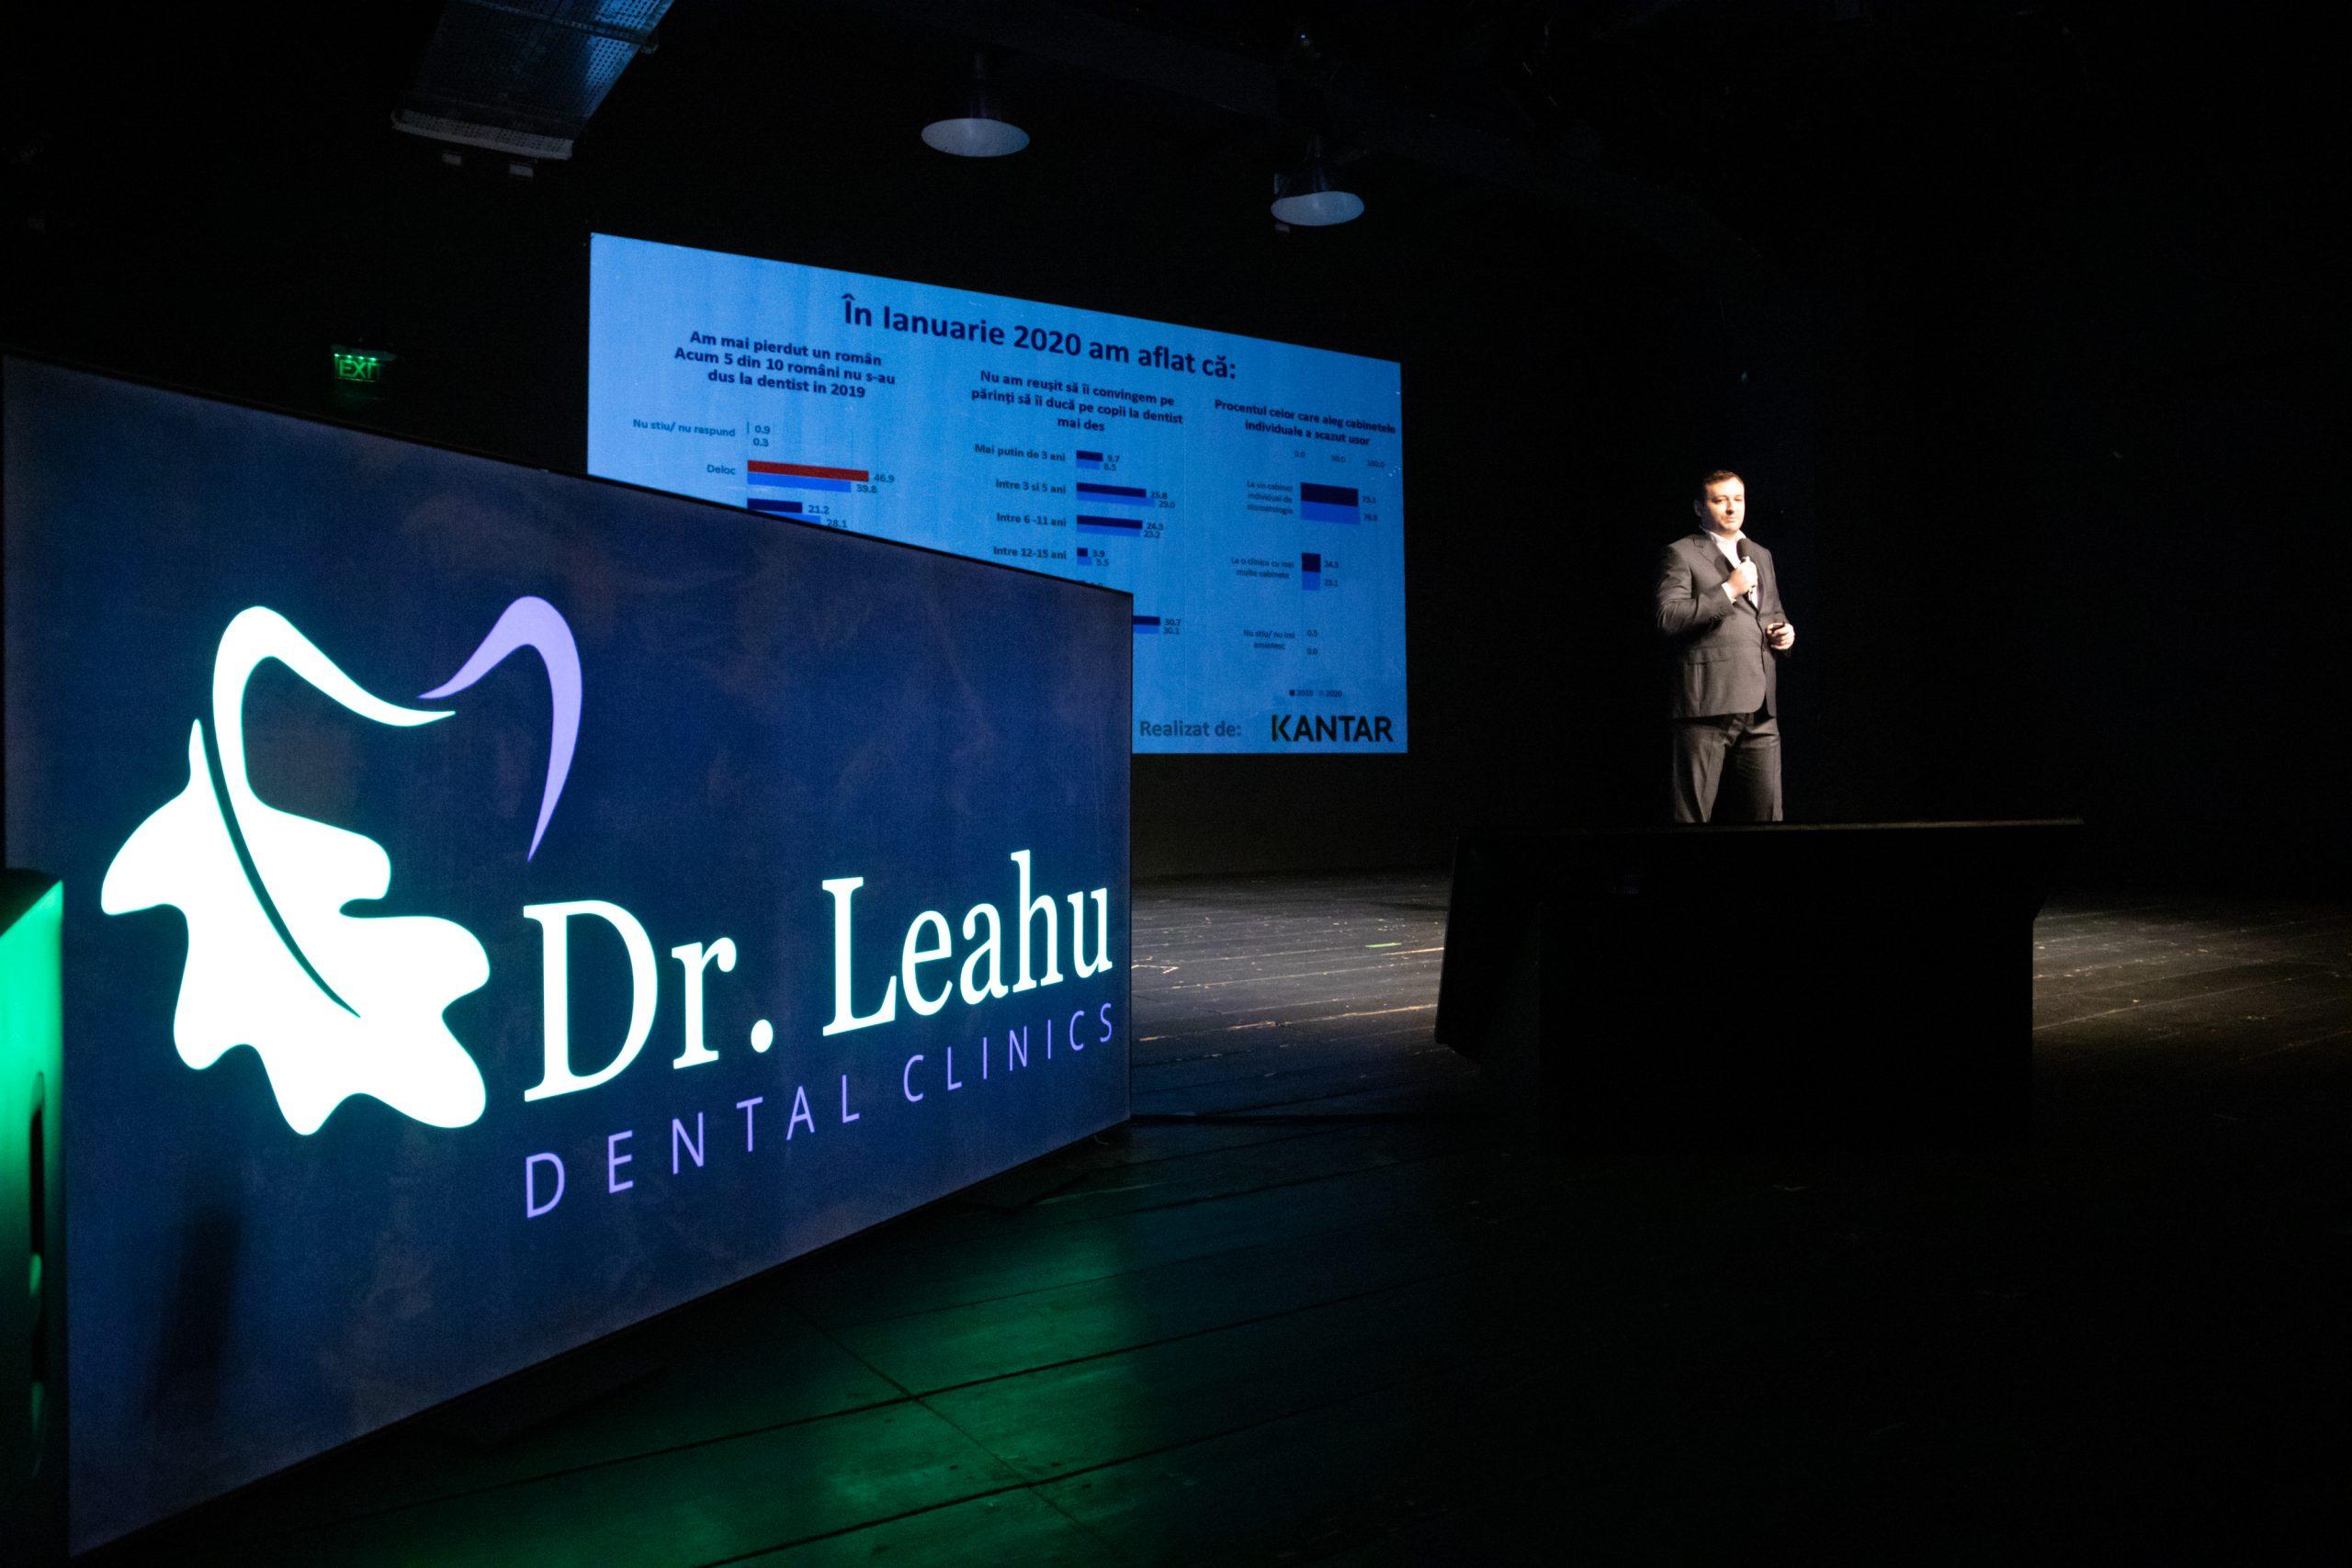 Conferinta Clincile Dentare Dr. Leahu